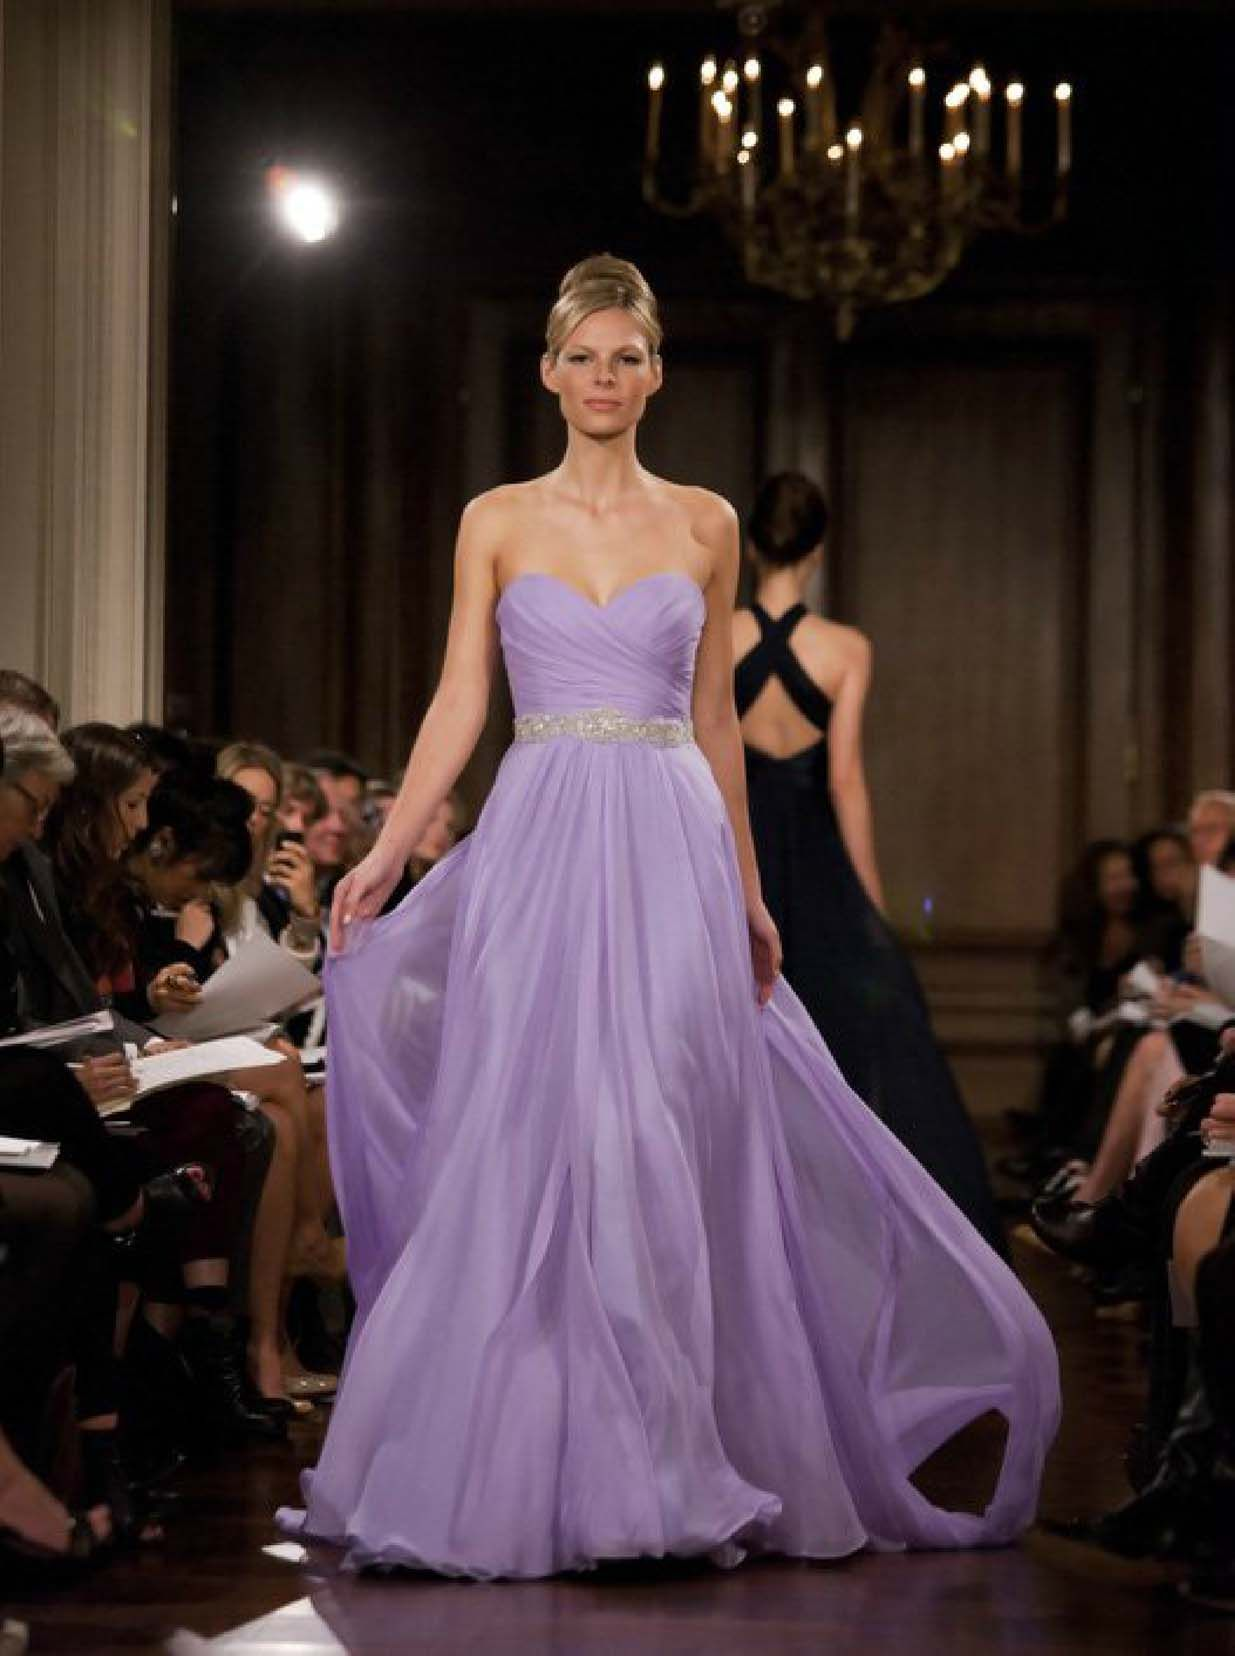 i love | Fashion | Pinterest | Damitas de honor, Damas y Inspiración